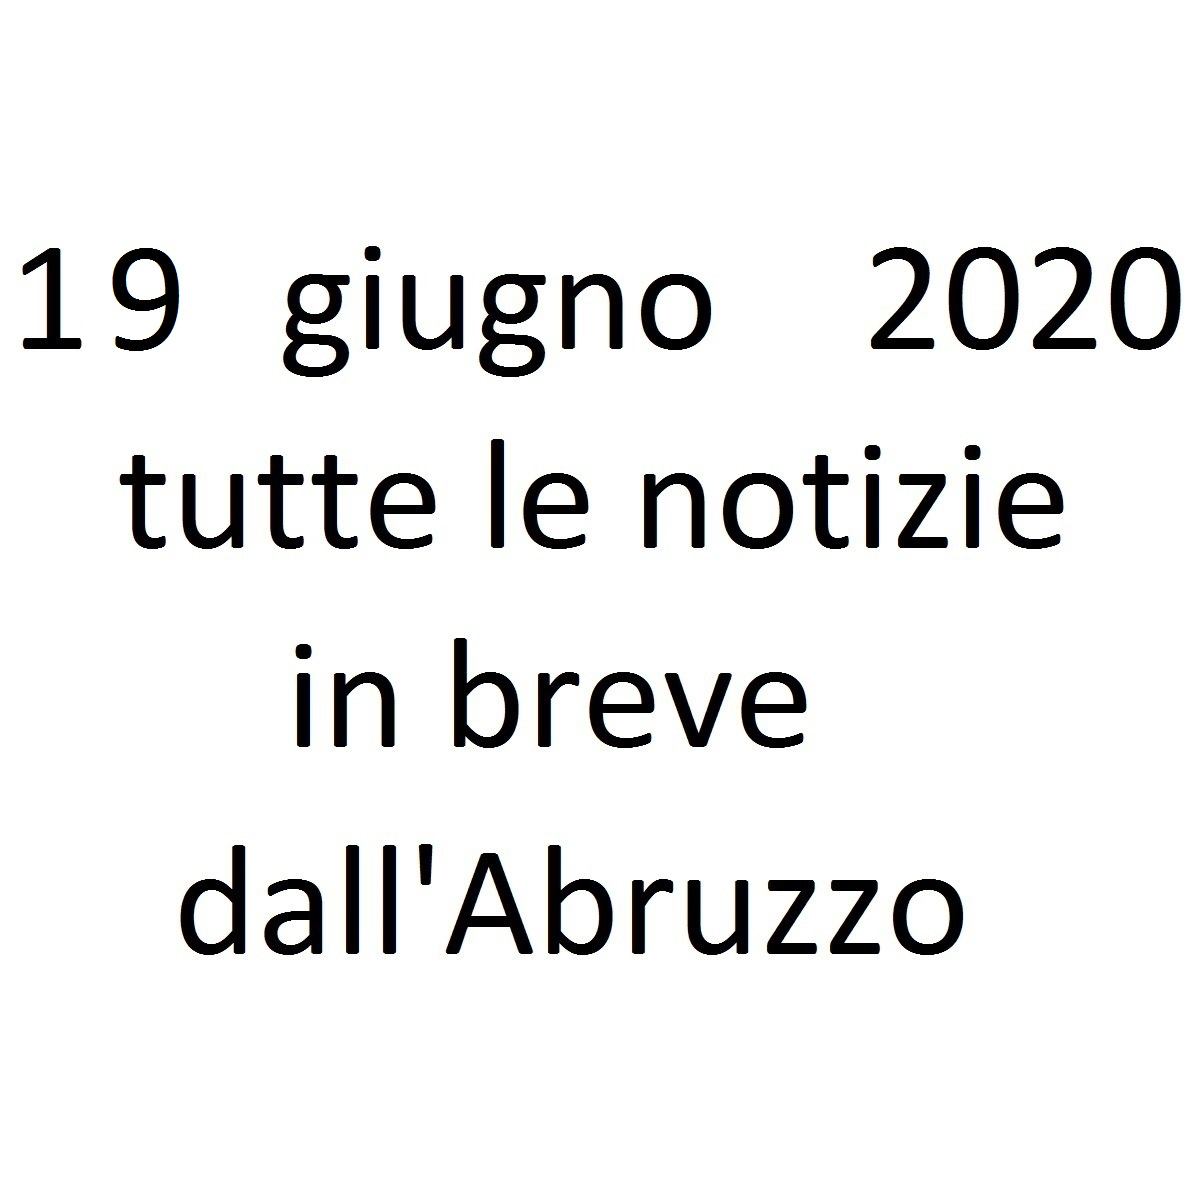 19 giugno 2020 notizie in breve foto